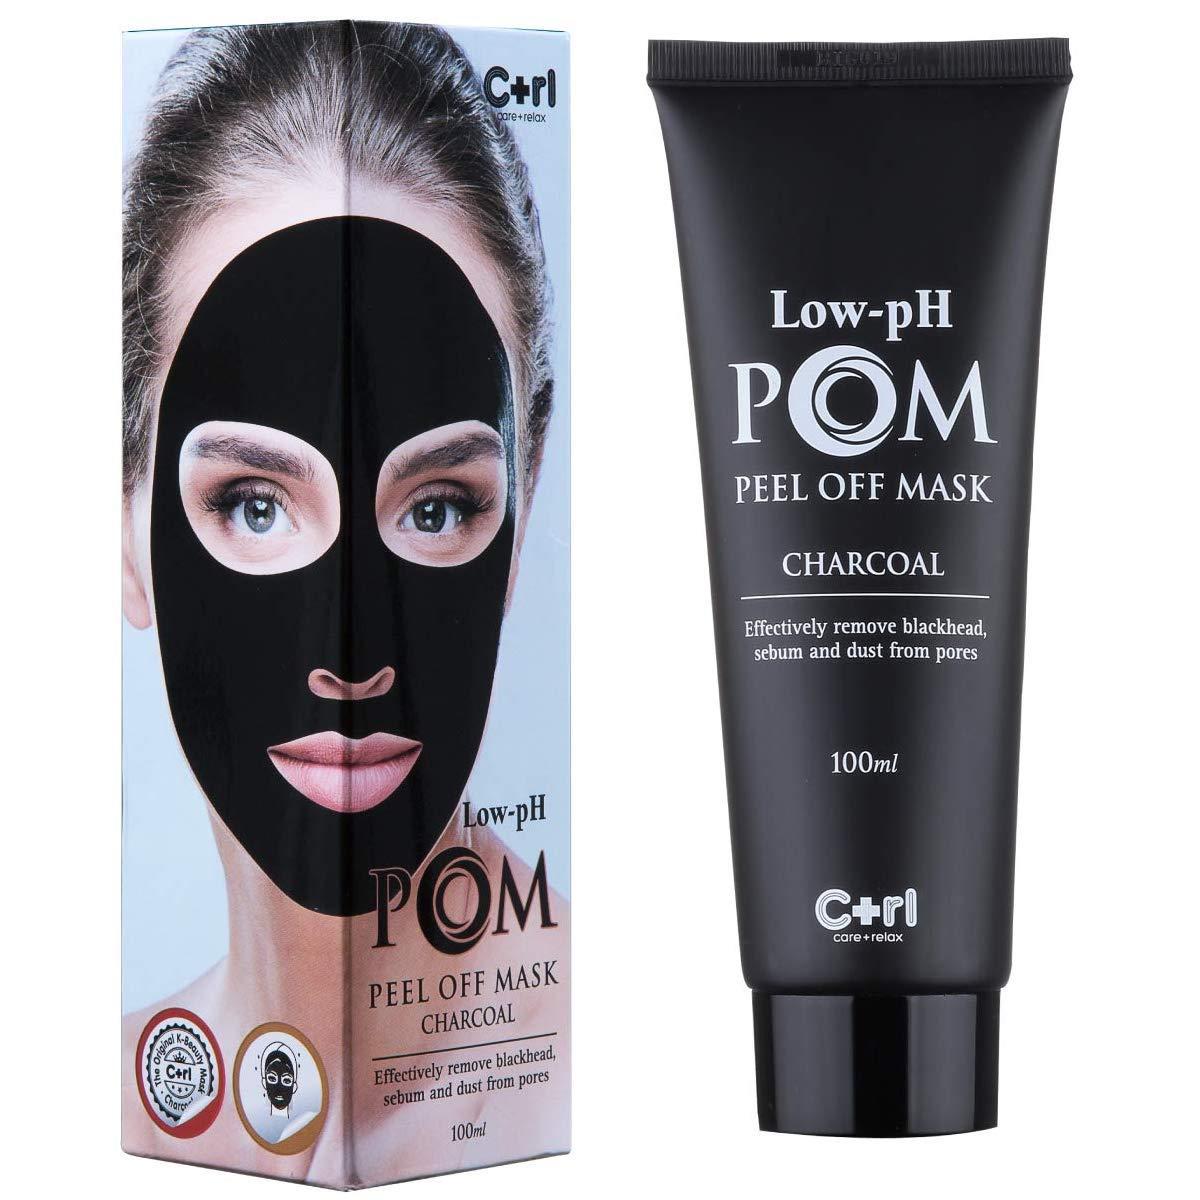 Маска для лица C+rl Low-ph Pom Feel Off Mask 100 мл (8809288260036)